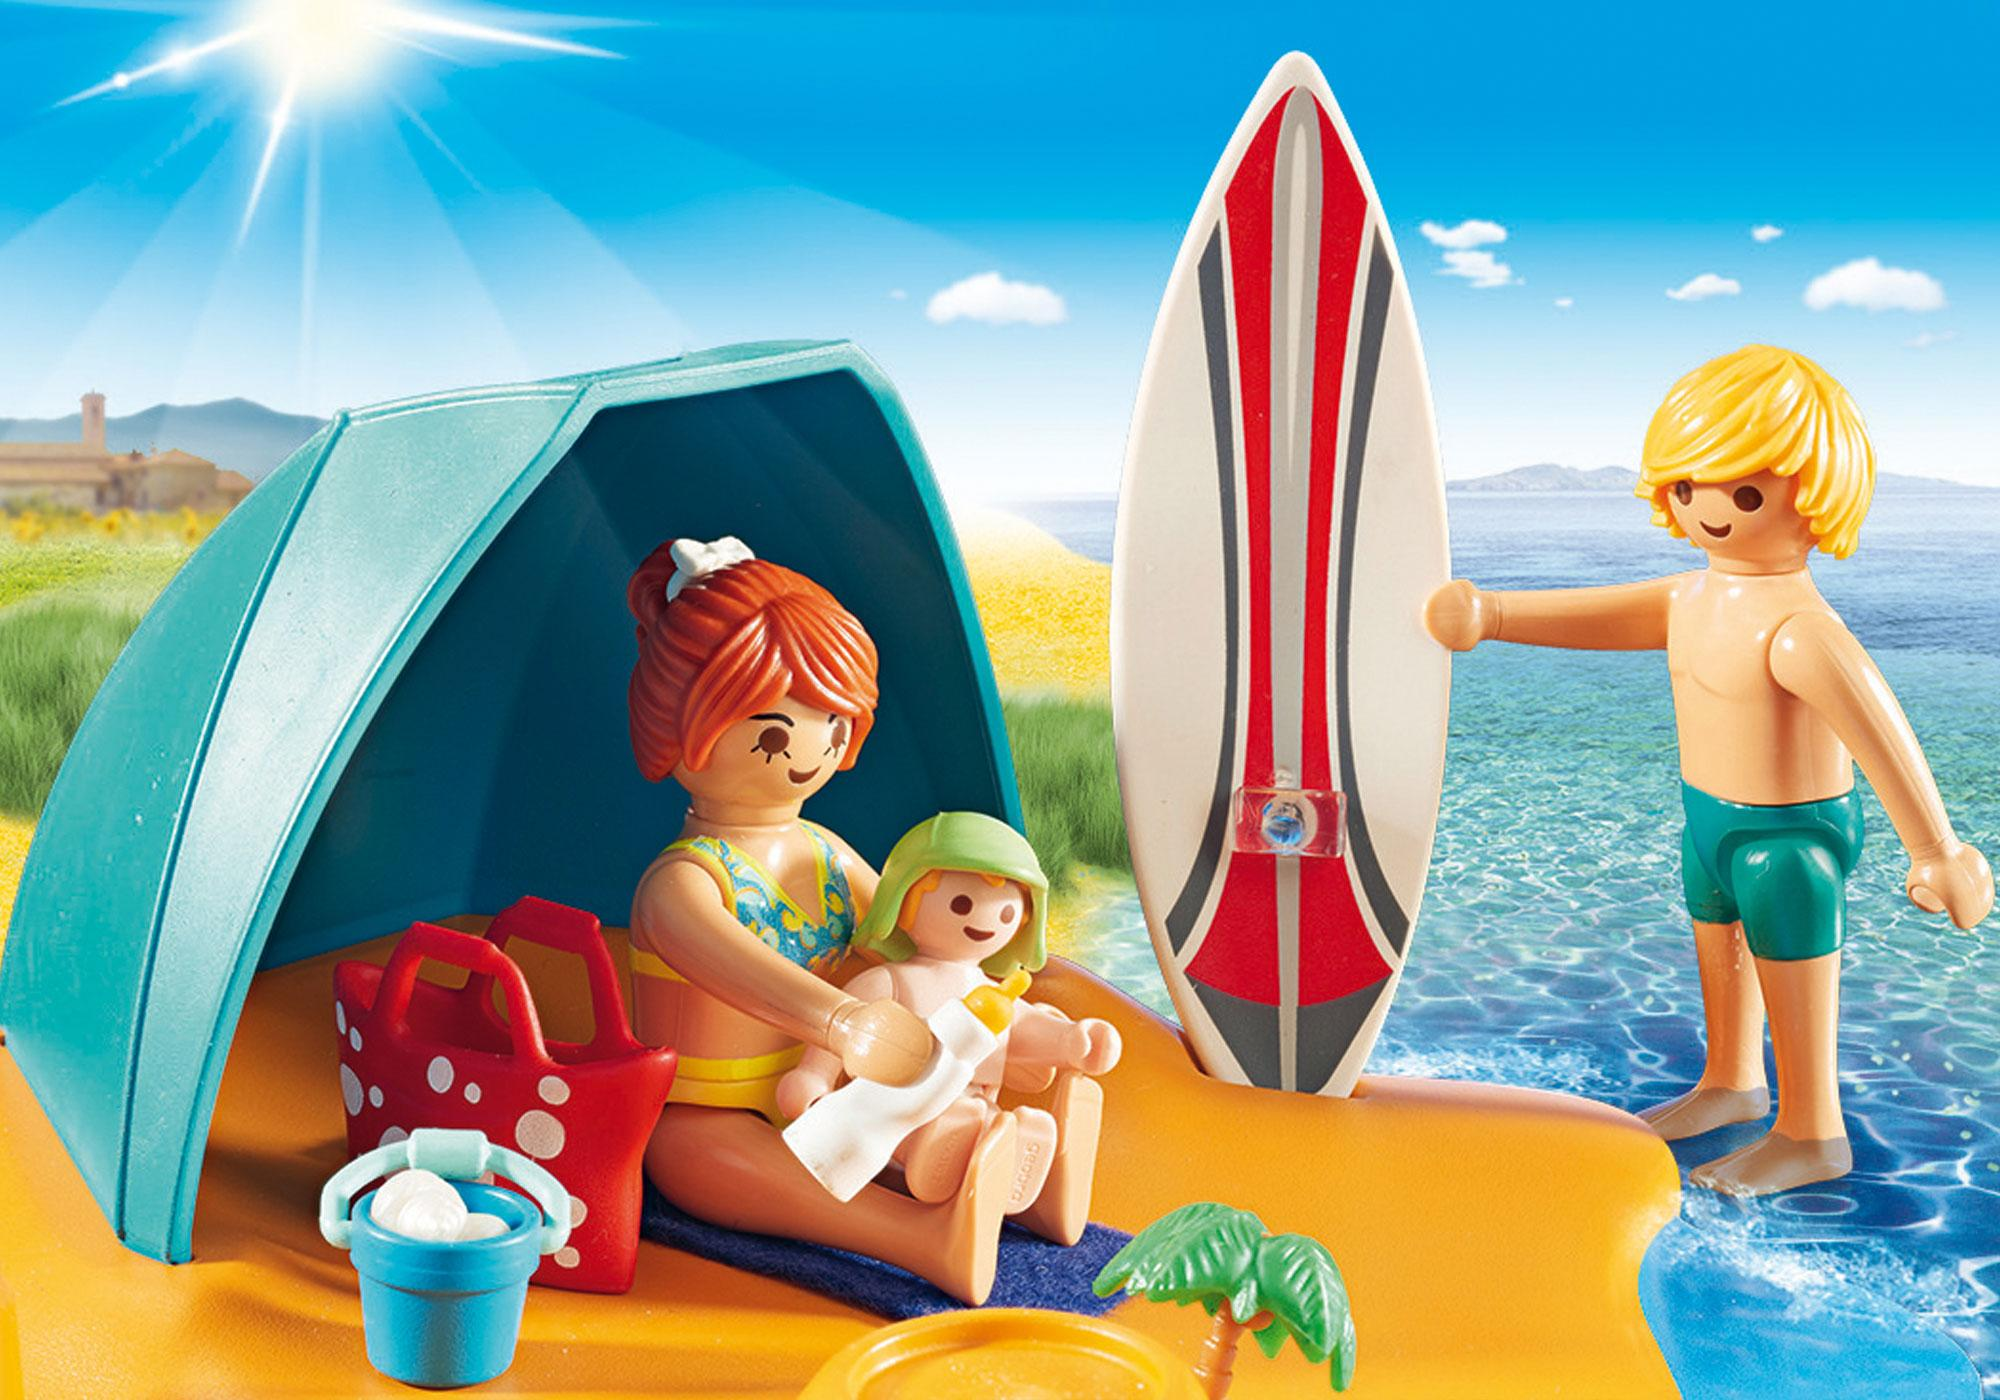 http://media.playmobil.com/i/playmobil/9425_product_extra1/Οικογενειακή διασκέδαση στην παραλία